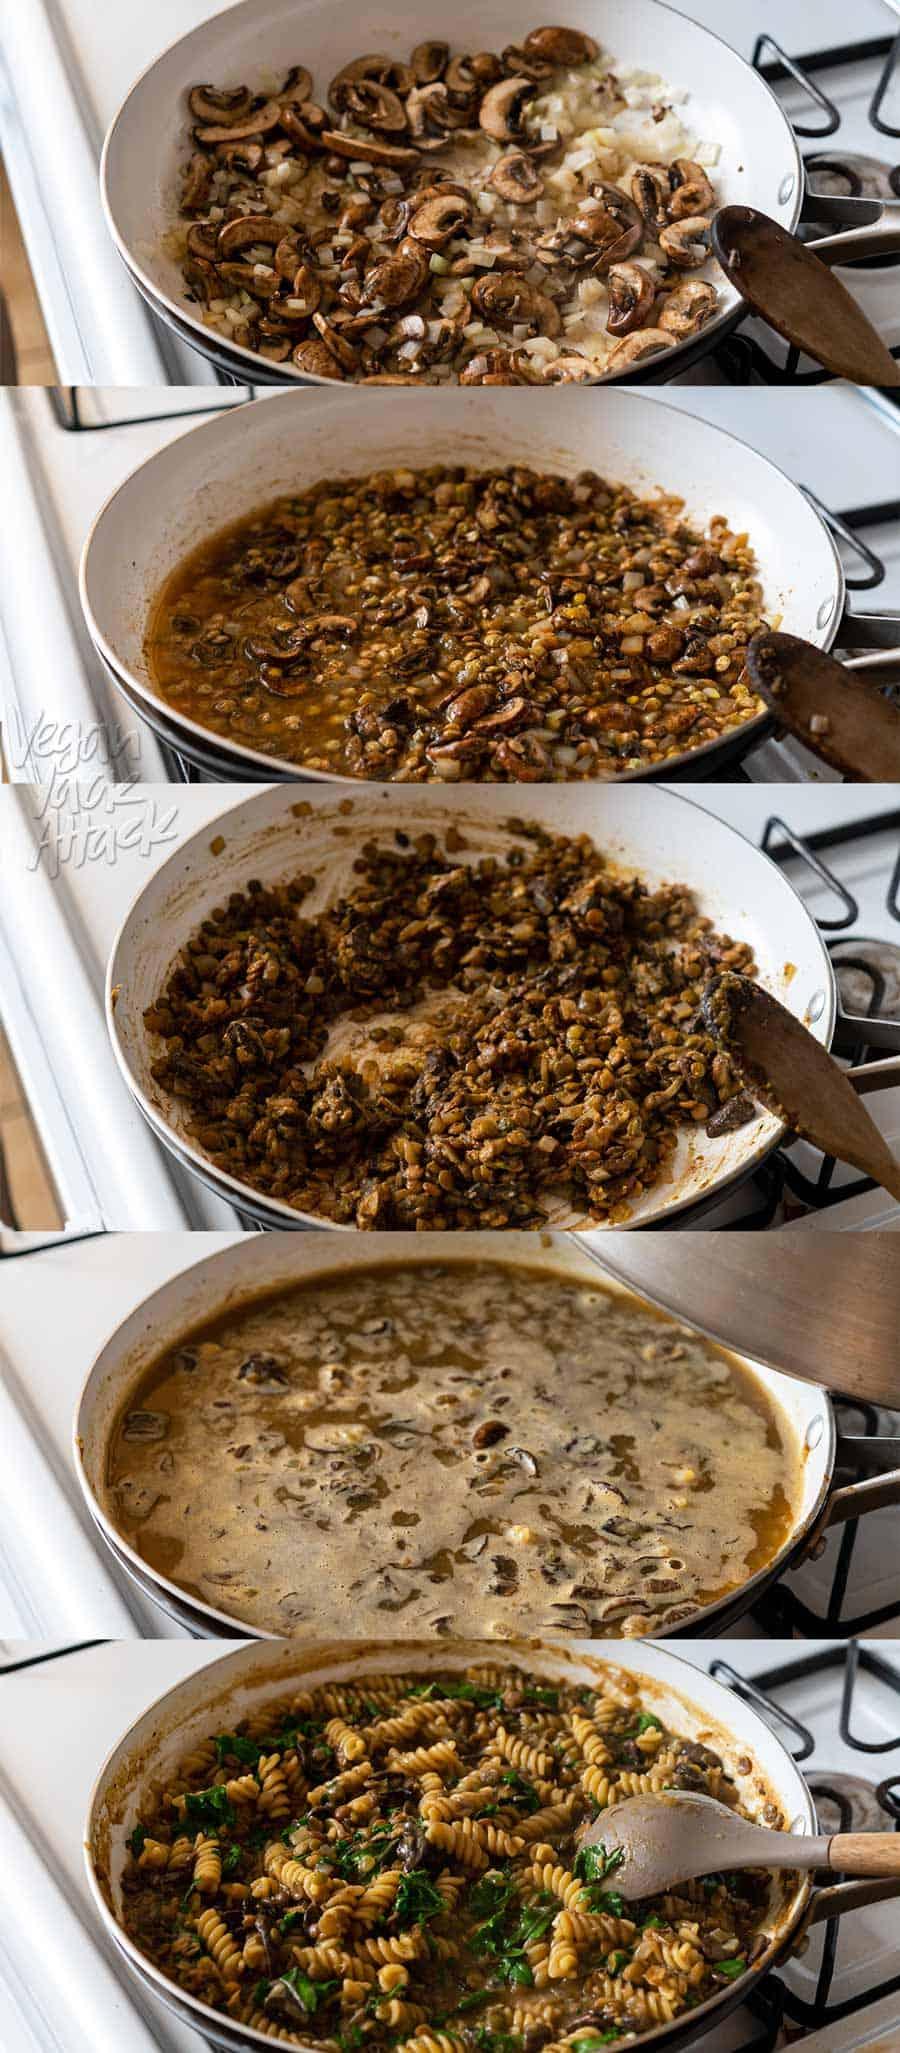 Image collage of steps in cooking vegan pasta dish